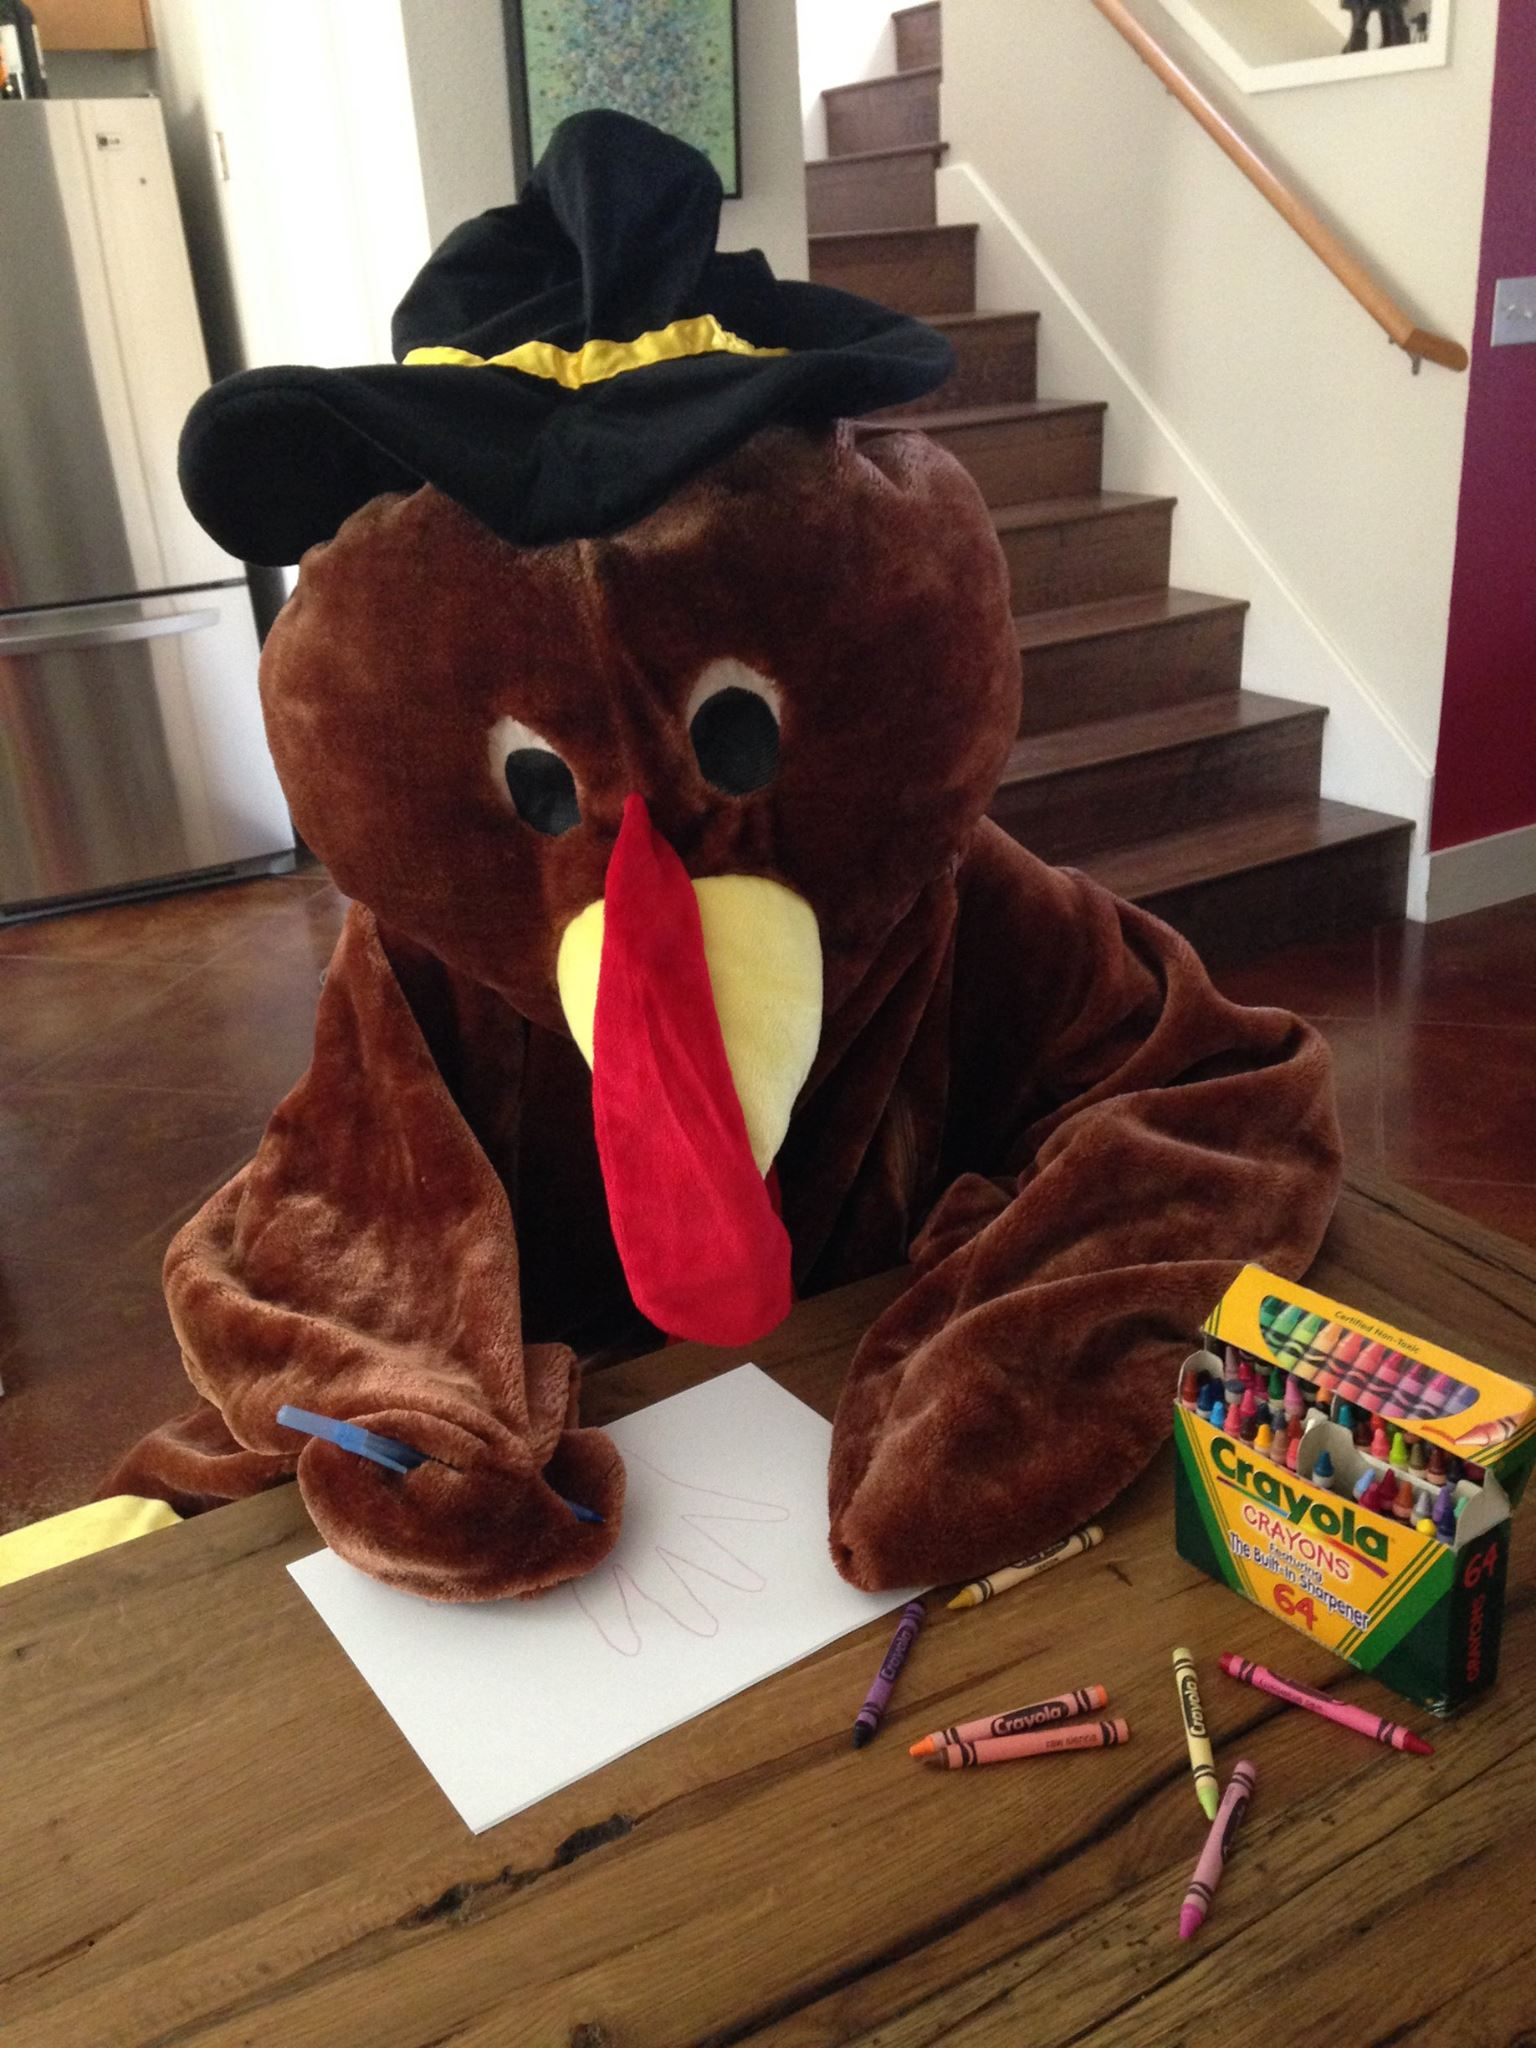 Turkey Trot art contest